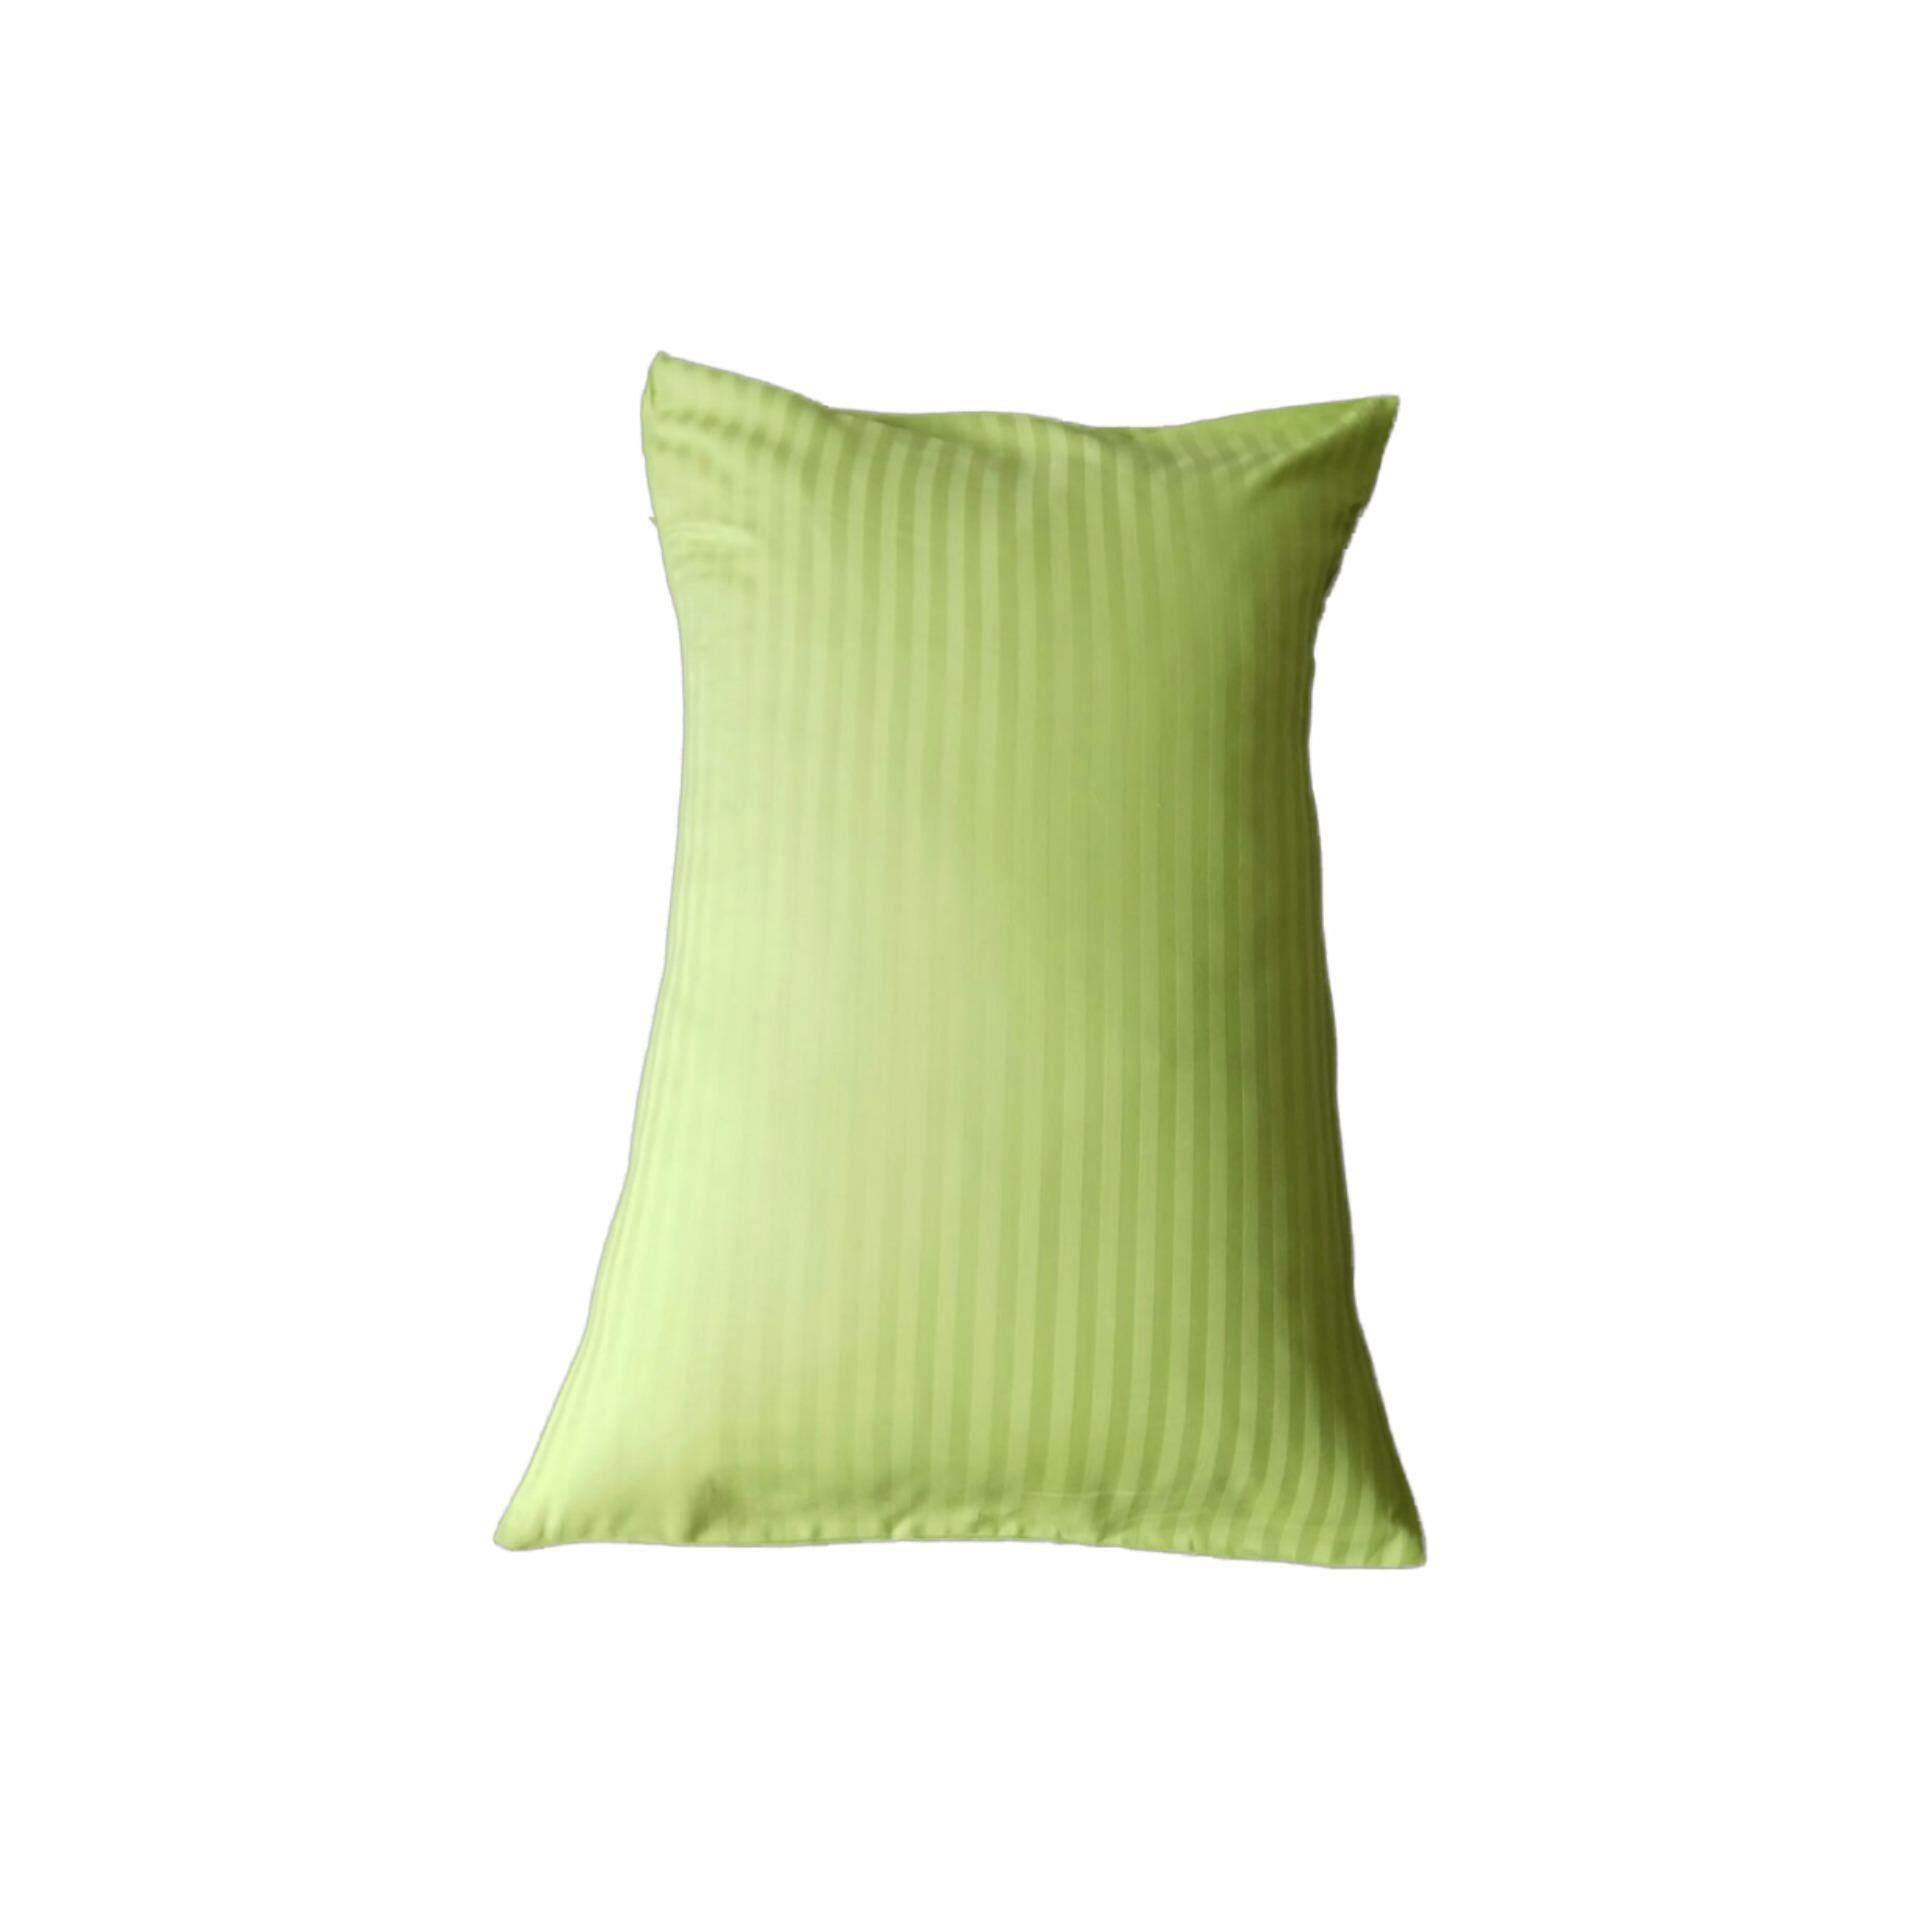 Ladubee Head Pillow Cover (Green Satin Stripes)